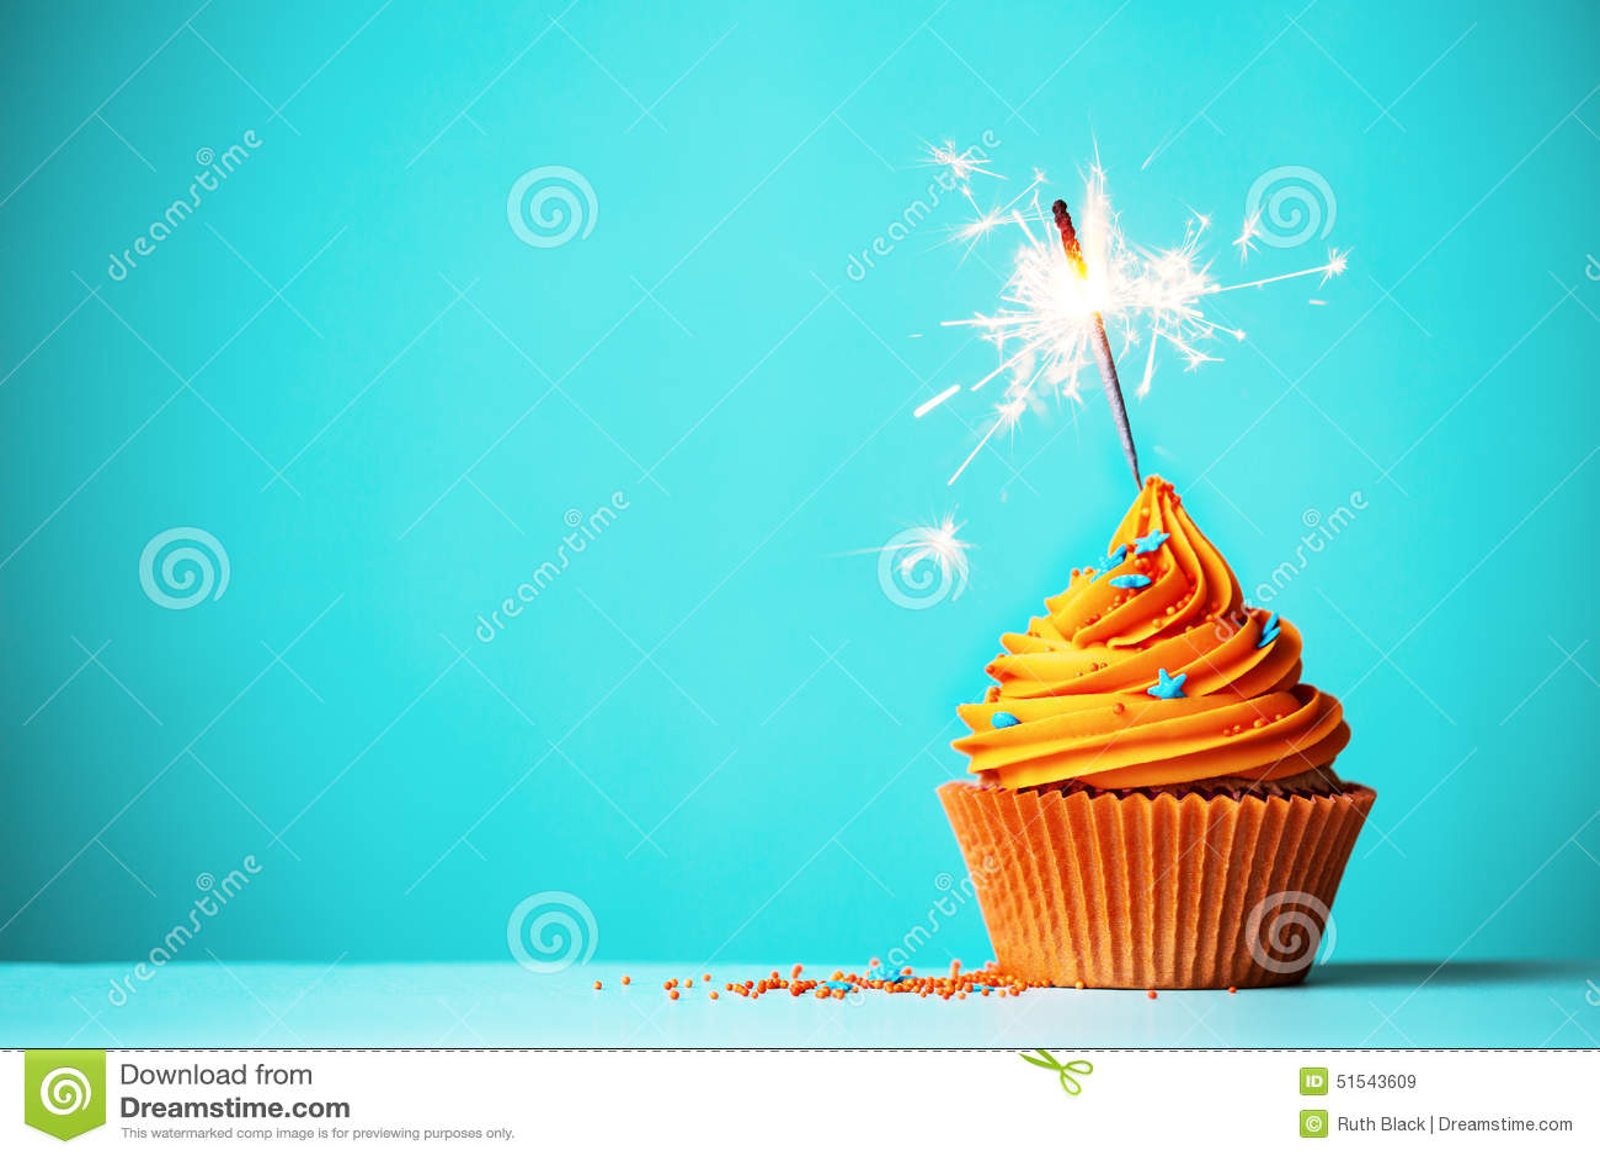 Orange Cupcake With Sparkler Stock Image Image Of Cakes